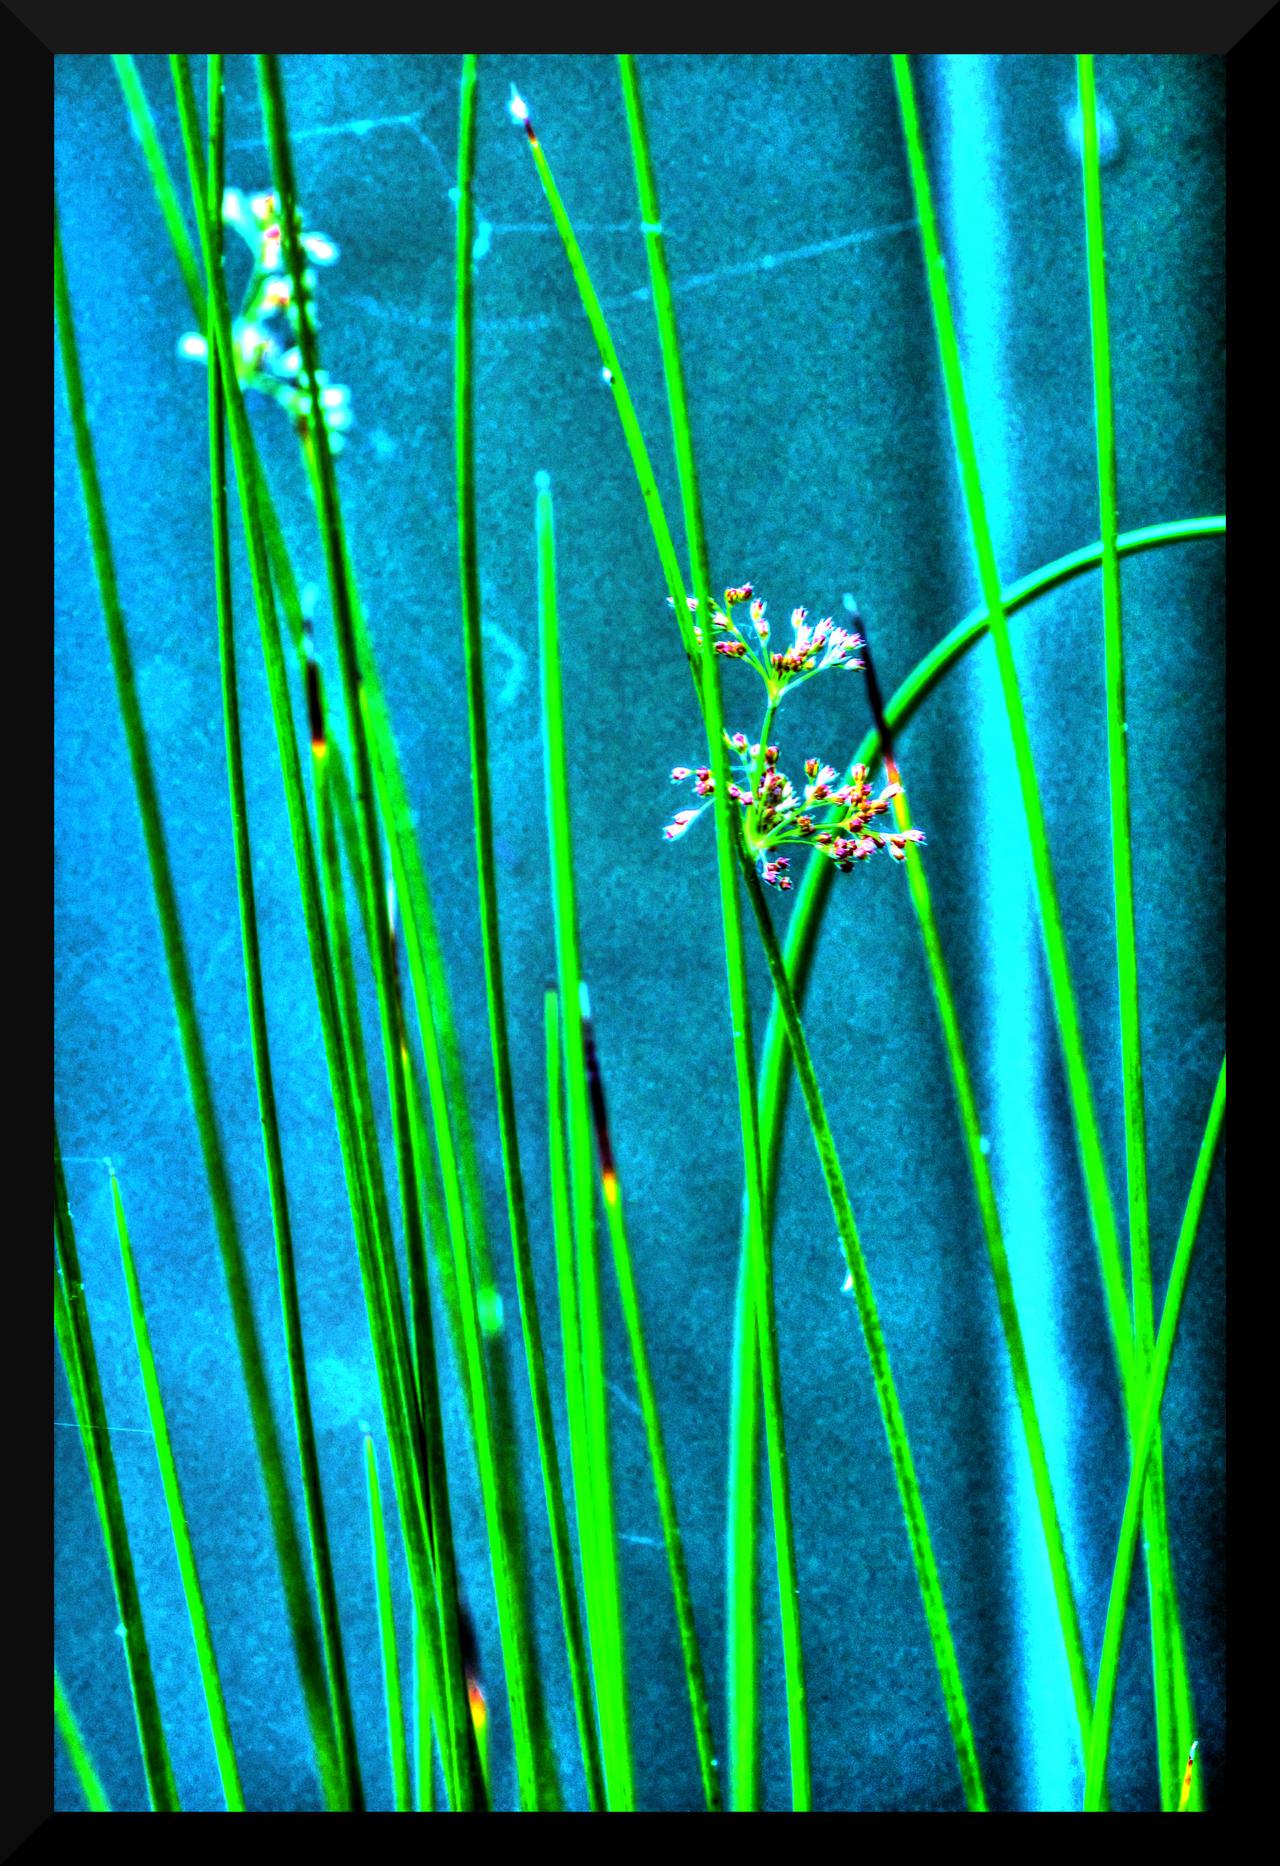 blue grass by mikestevenson1955